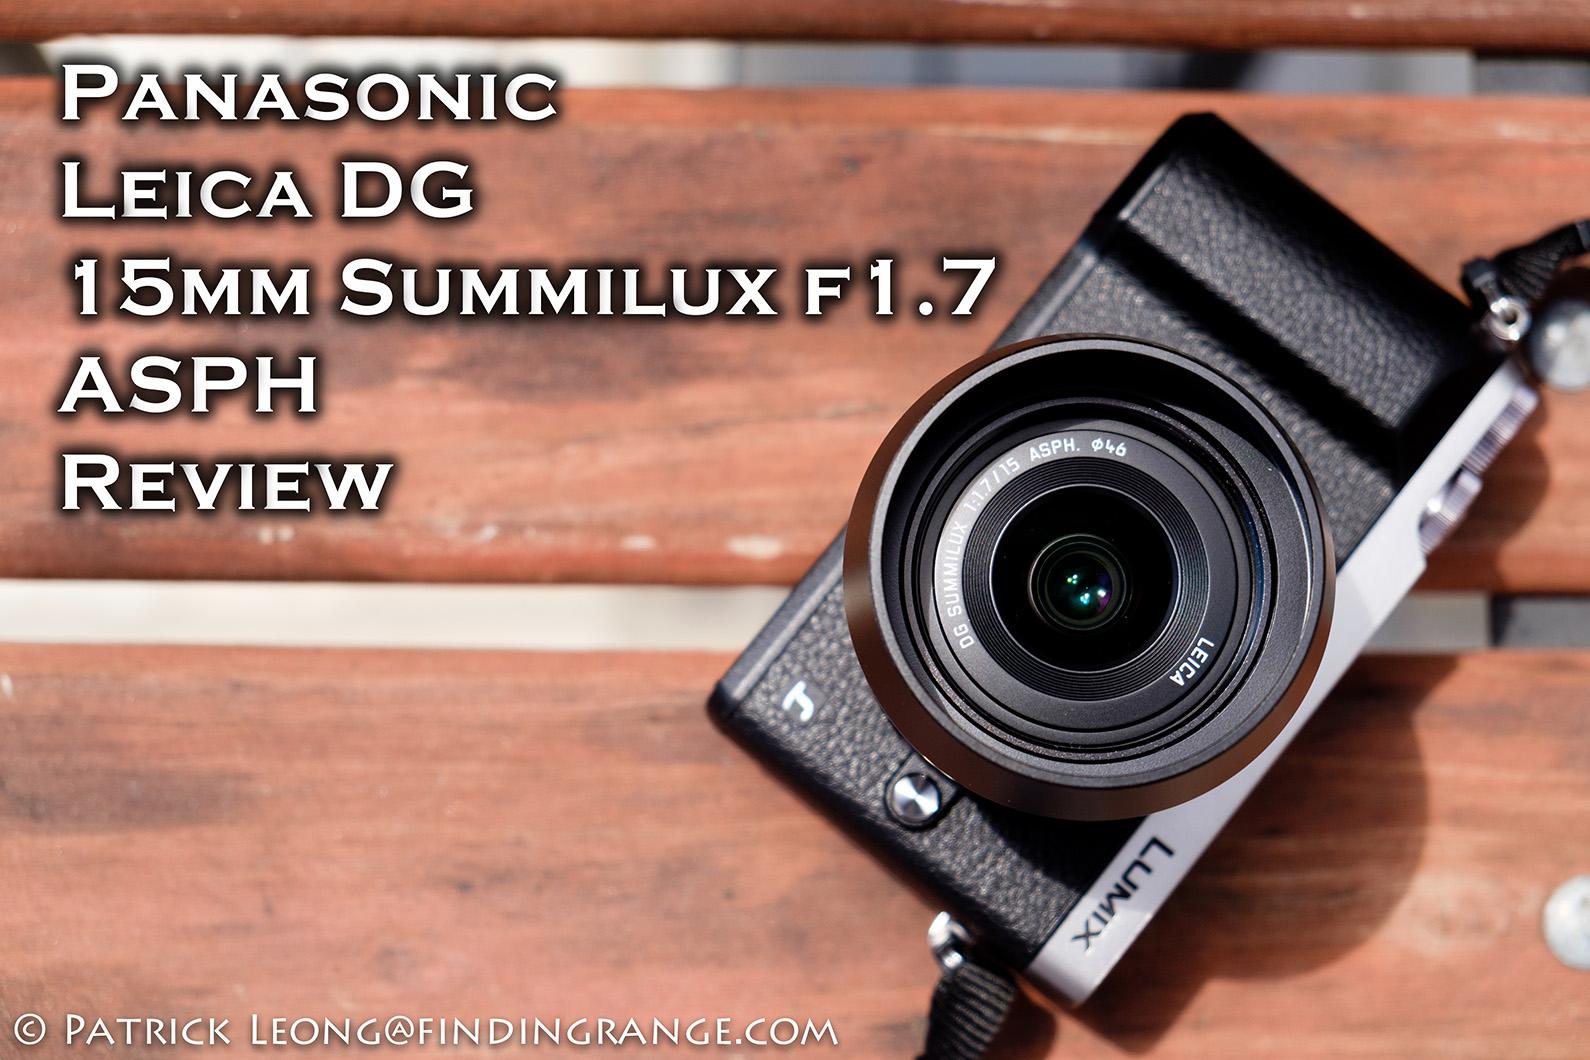 Panasonic-Lumix-GX85-Leica-DG-15-Summilux-f1.7-ASPH-Review-1